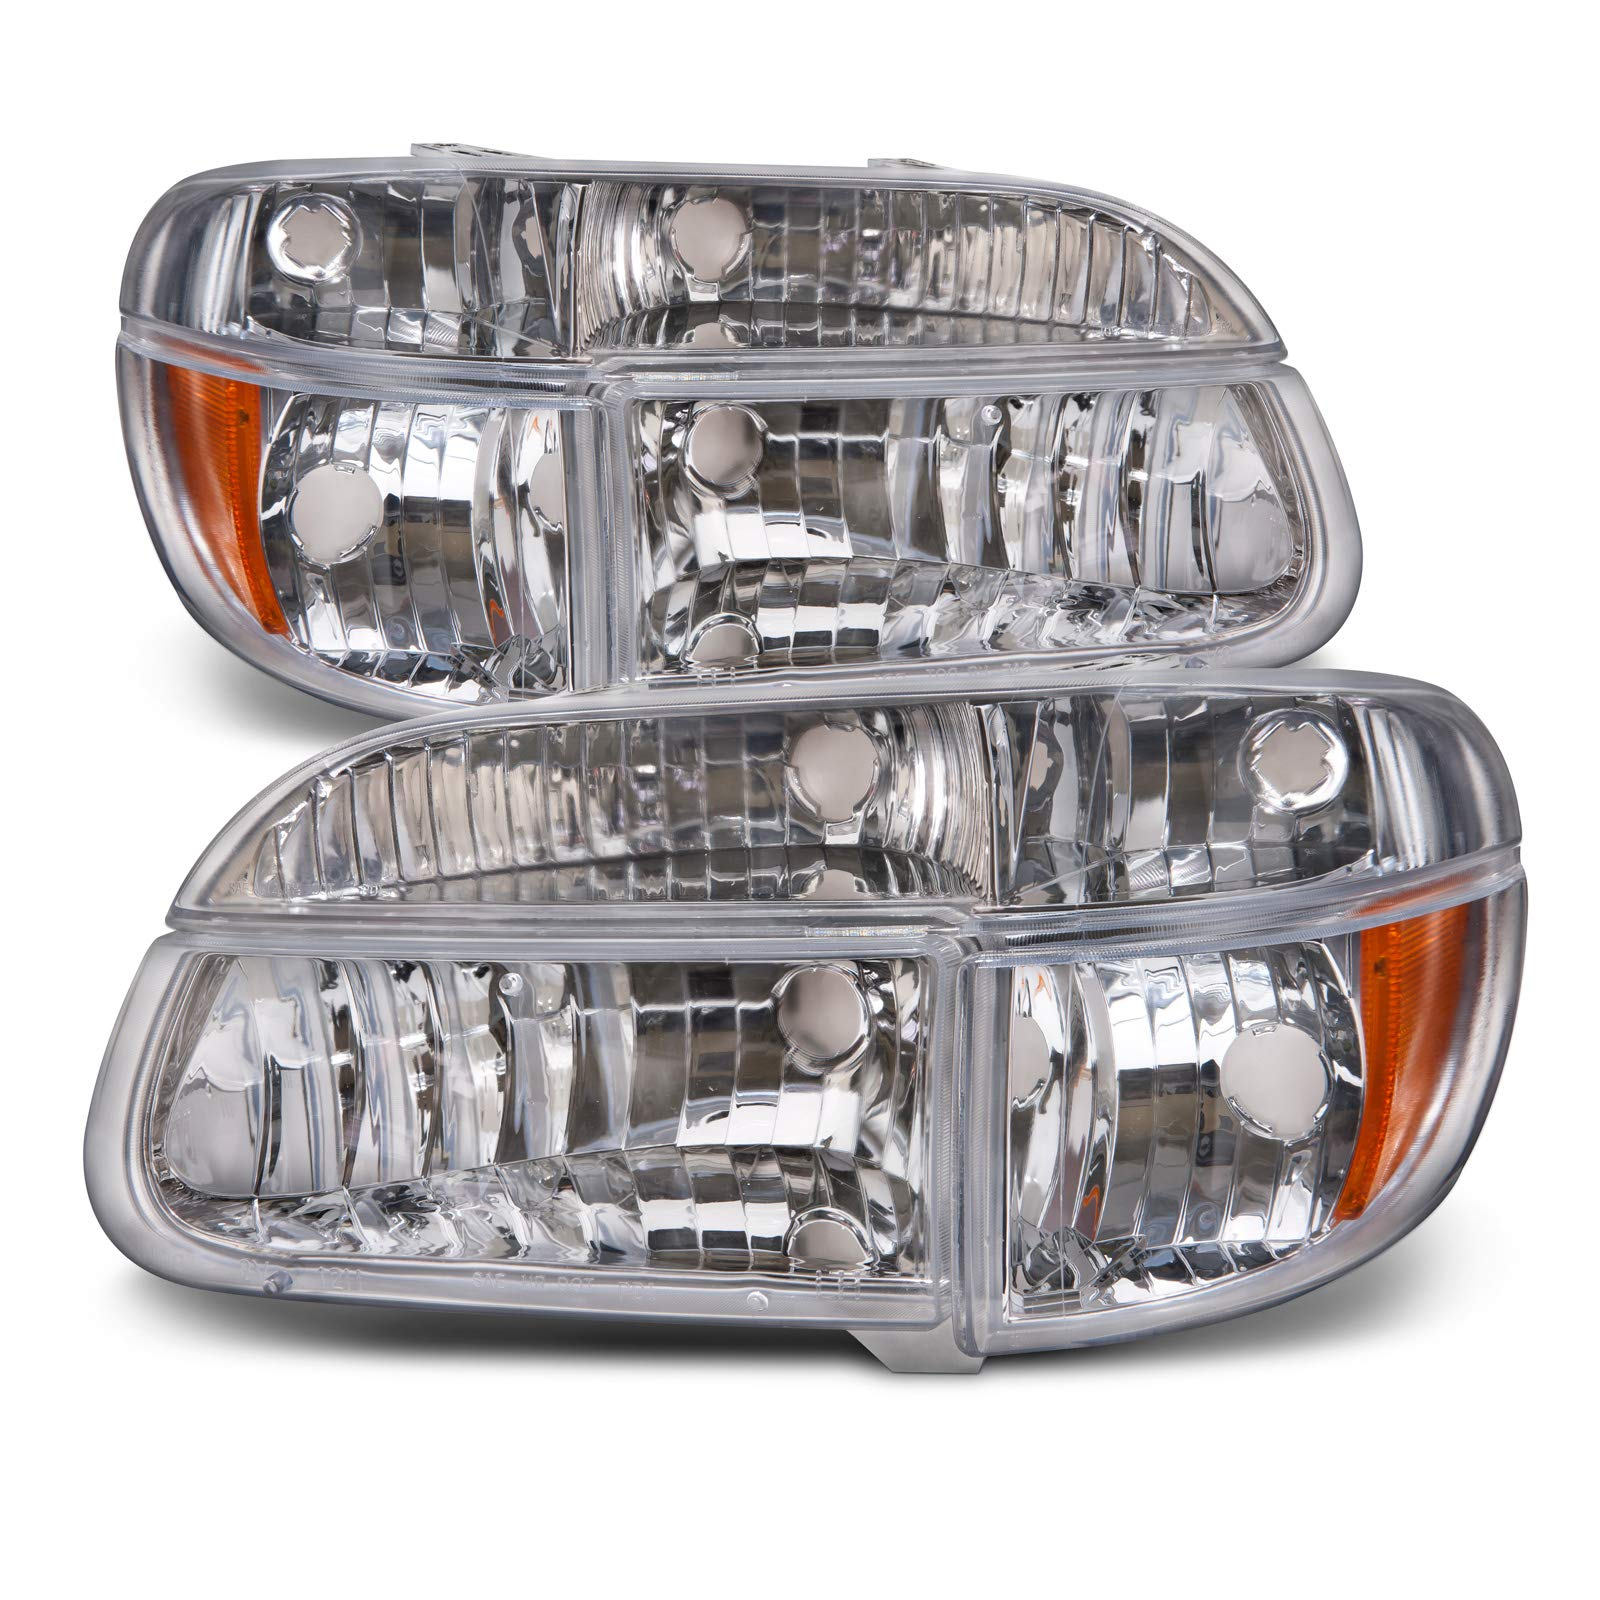 HEADLIGHTSDEPOT Compatible with Holiday Rambler Endeavor 1998-2001 Motorhome RV Front Headlight Set